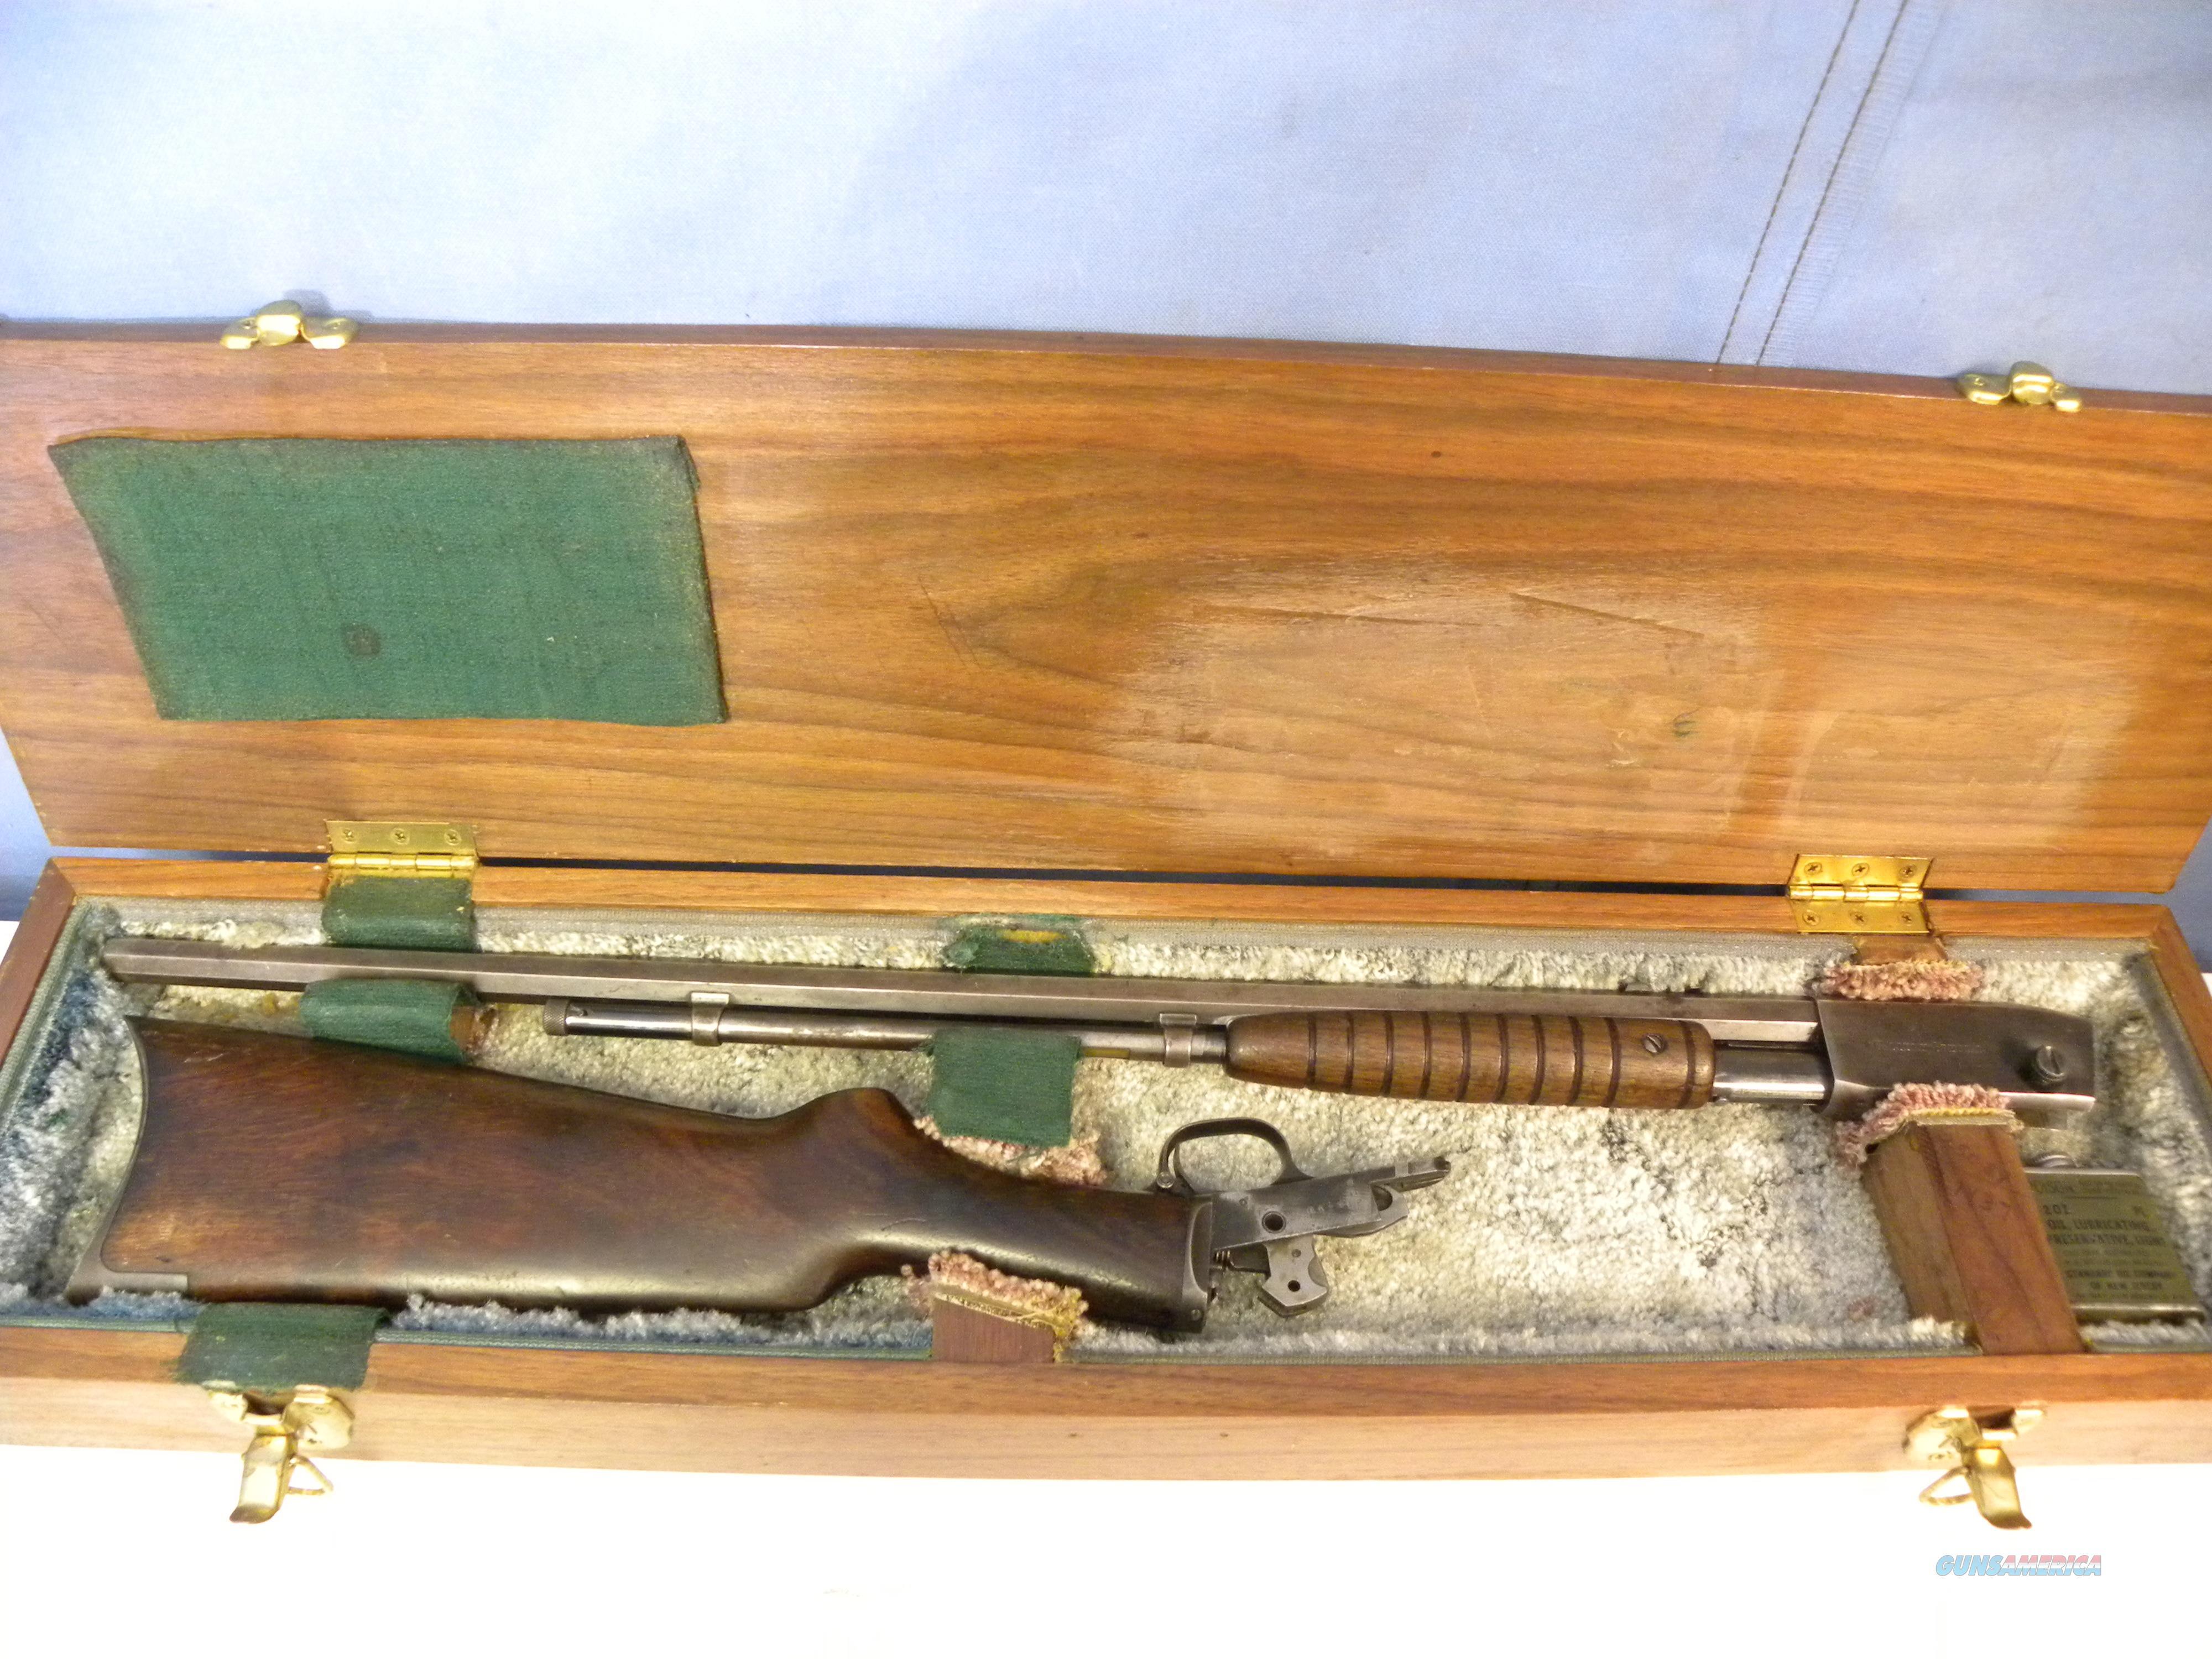 Remington Gallery Special 12B .22 Short  Guns > Rifles > Remington Rifles - Modern > .22 Rimfire Models